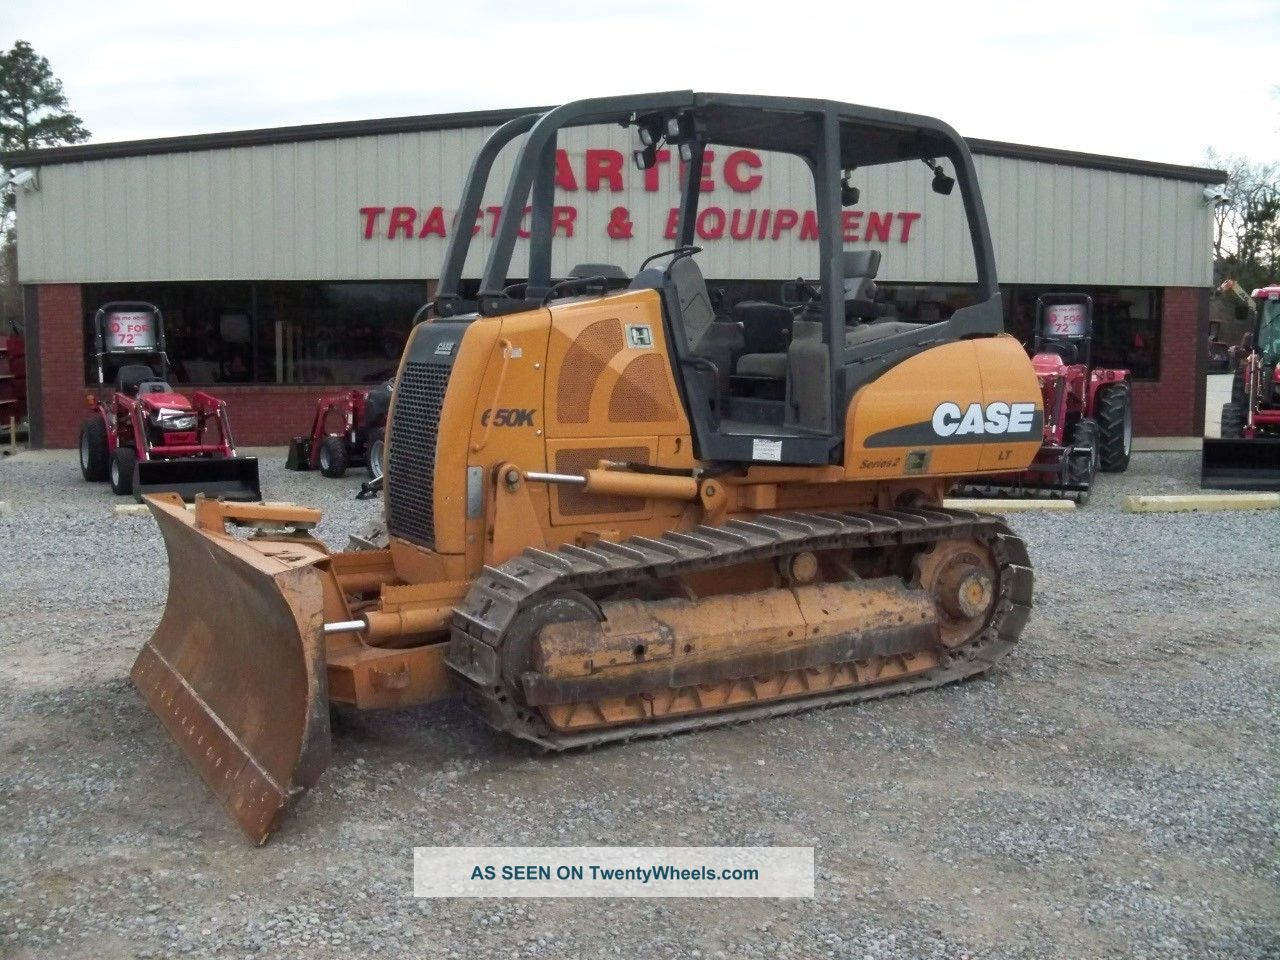 2007 Case 650k Lt Bulldozer - Dozer - Crawler Tractor - Excellent Undercarriage Crawler Dozers & Loaders photo